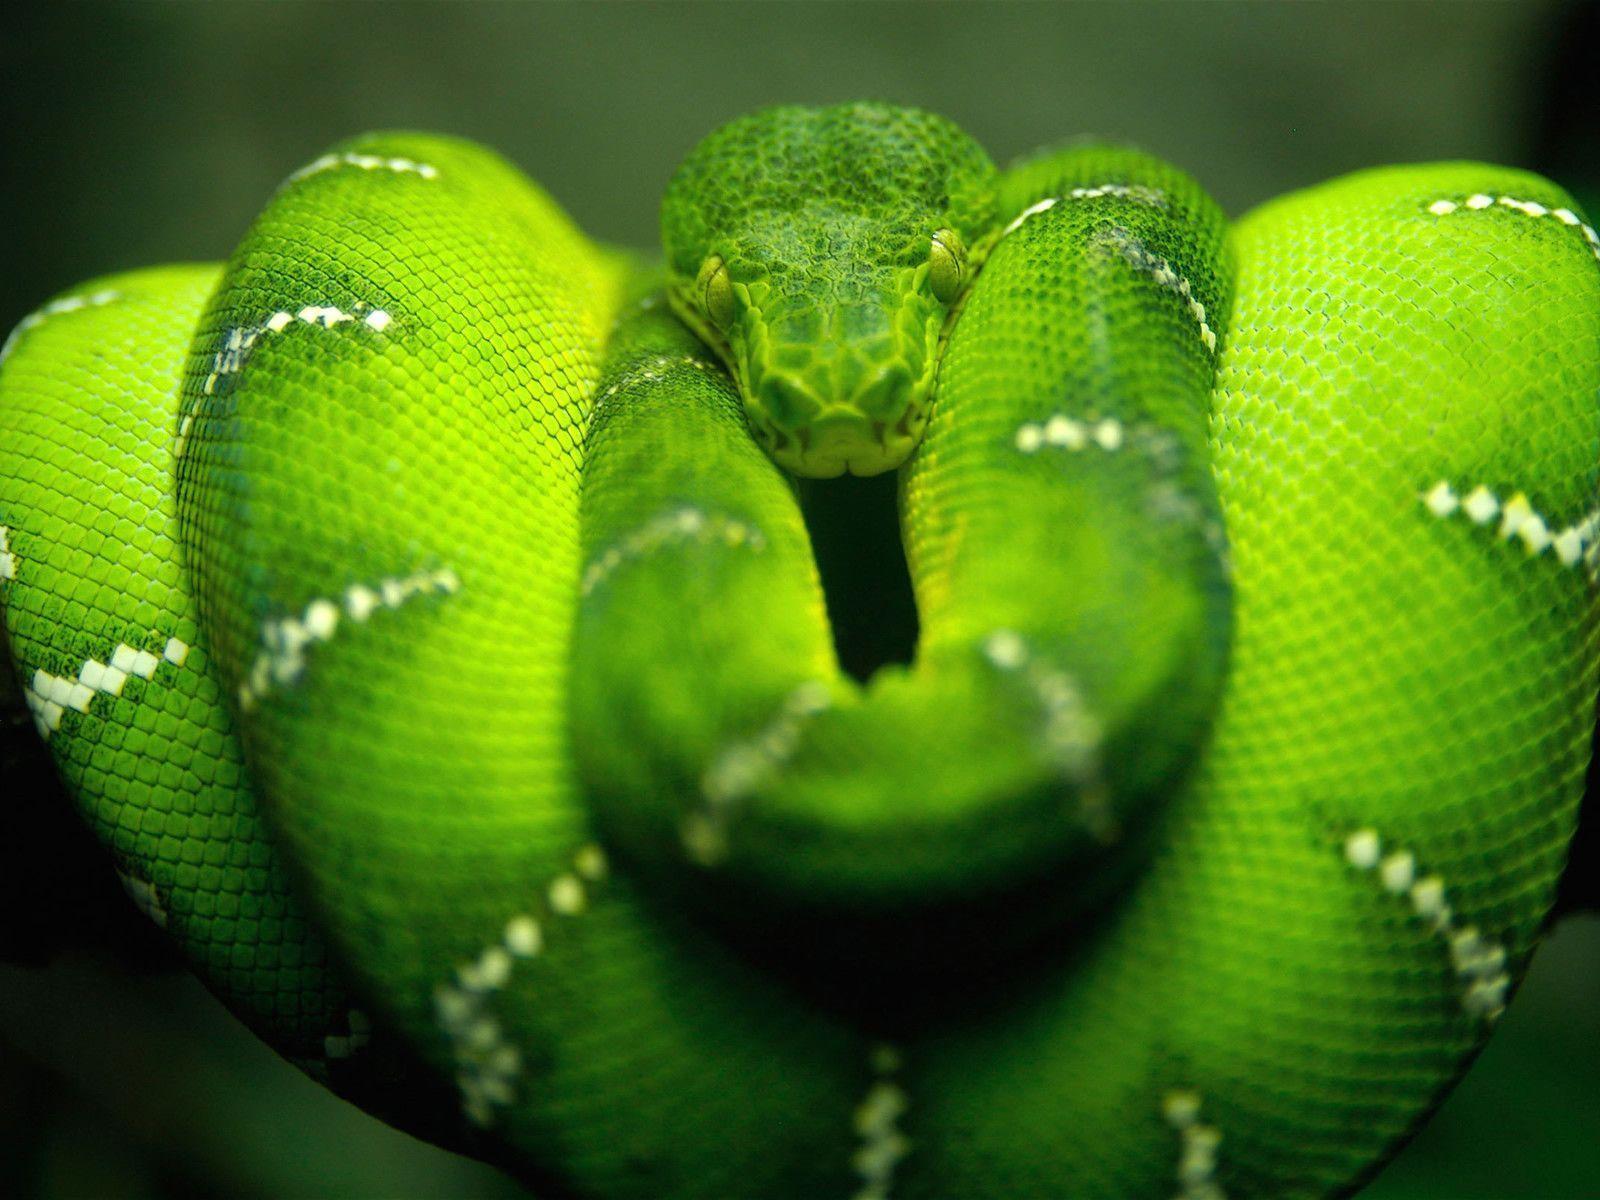 Snake Desktop Wallpapers | Snake Wallpapers Free download | Cool ...